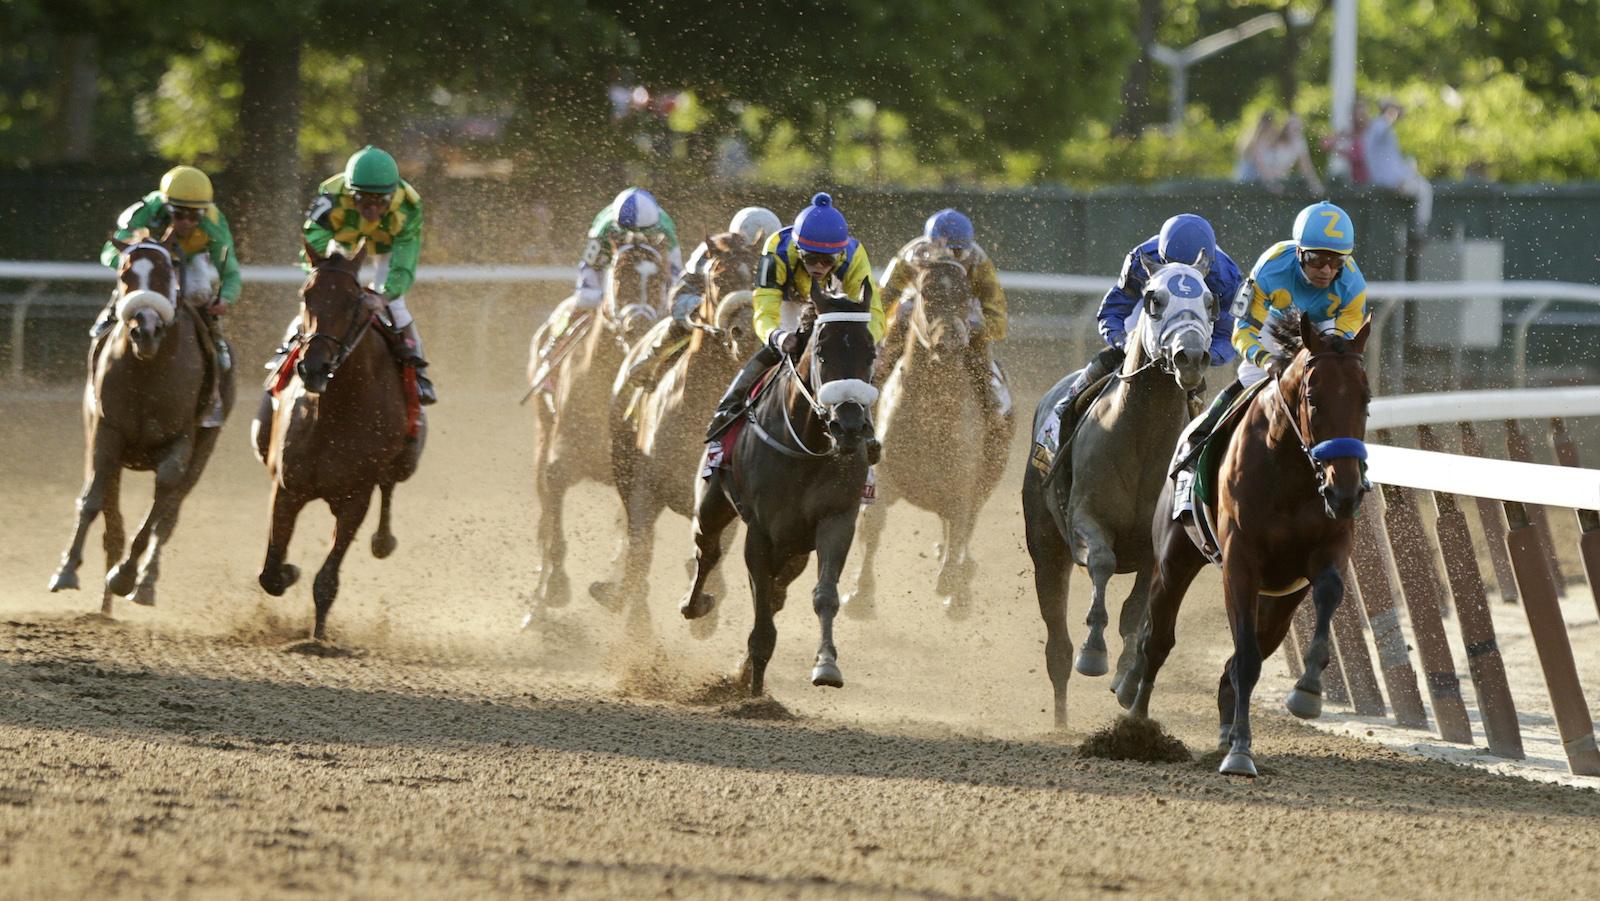 American Pharoah wins the Belmont Stakes